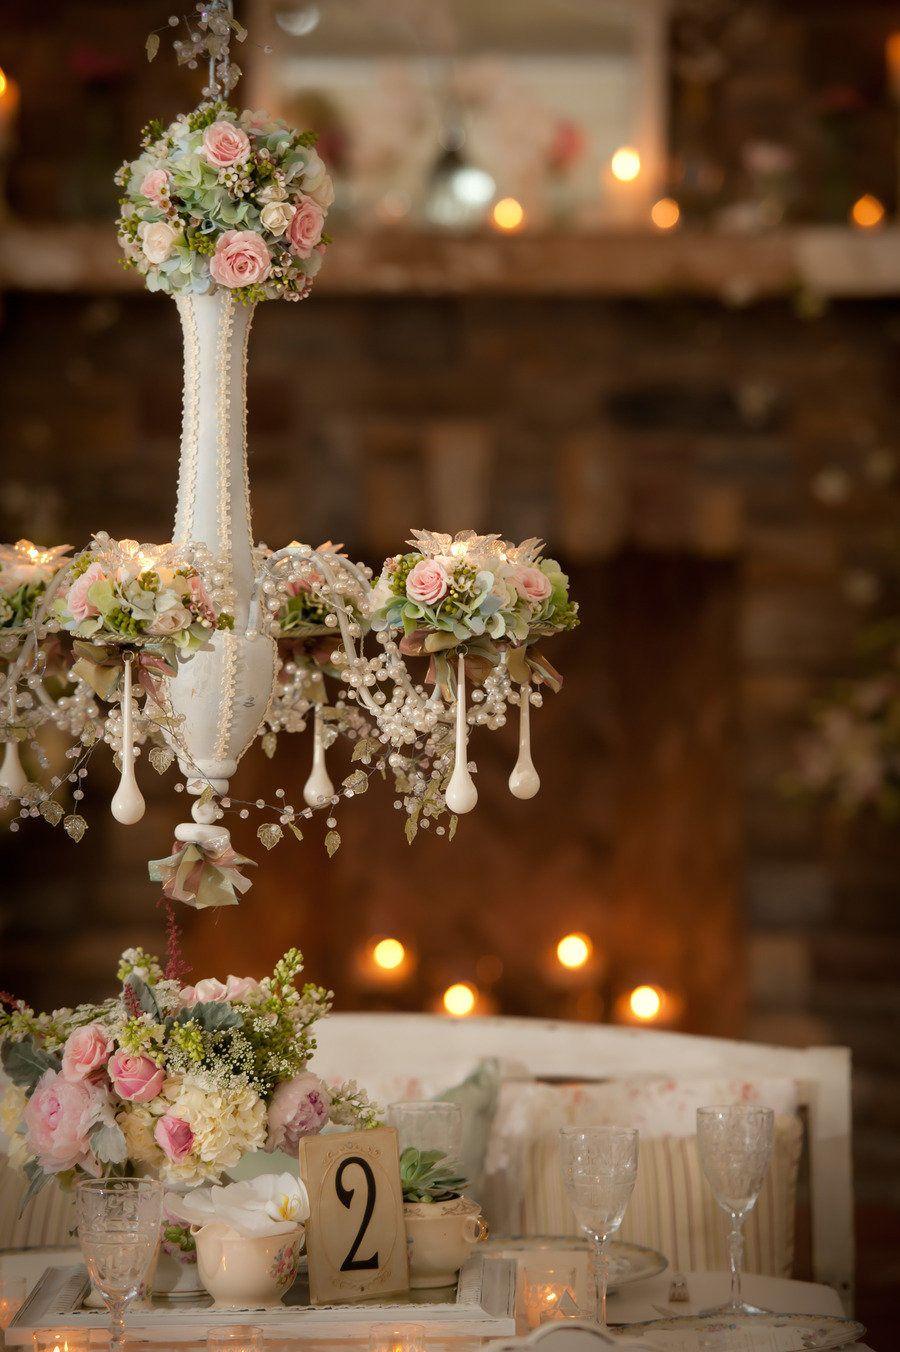 Photography: The Studio Photographers - thestudiophotographers.com/ Floral Design: MDS Floral Designs - mdsfloraldesigns.com  Read More: http://www.stylemepretty.com/2012/04/27/the-ashford-estate-wedding-inspiration-from-the-studio-photographers-mds-floral-designs/